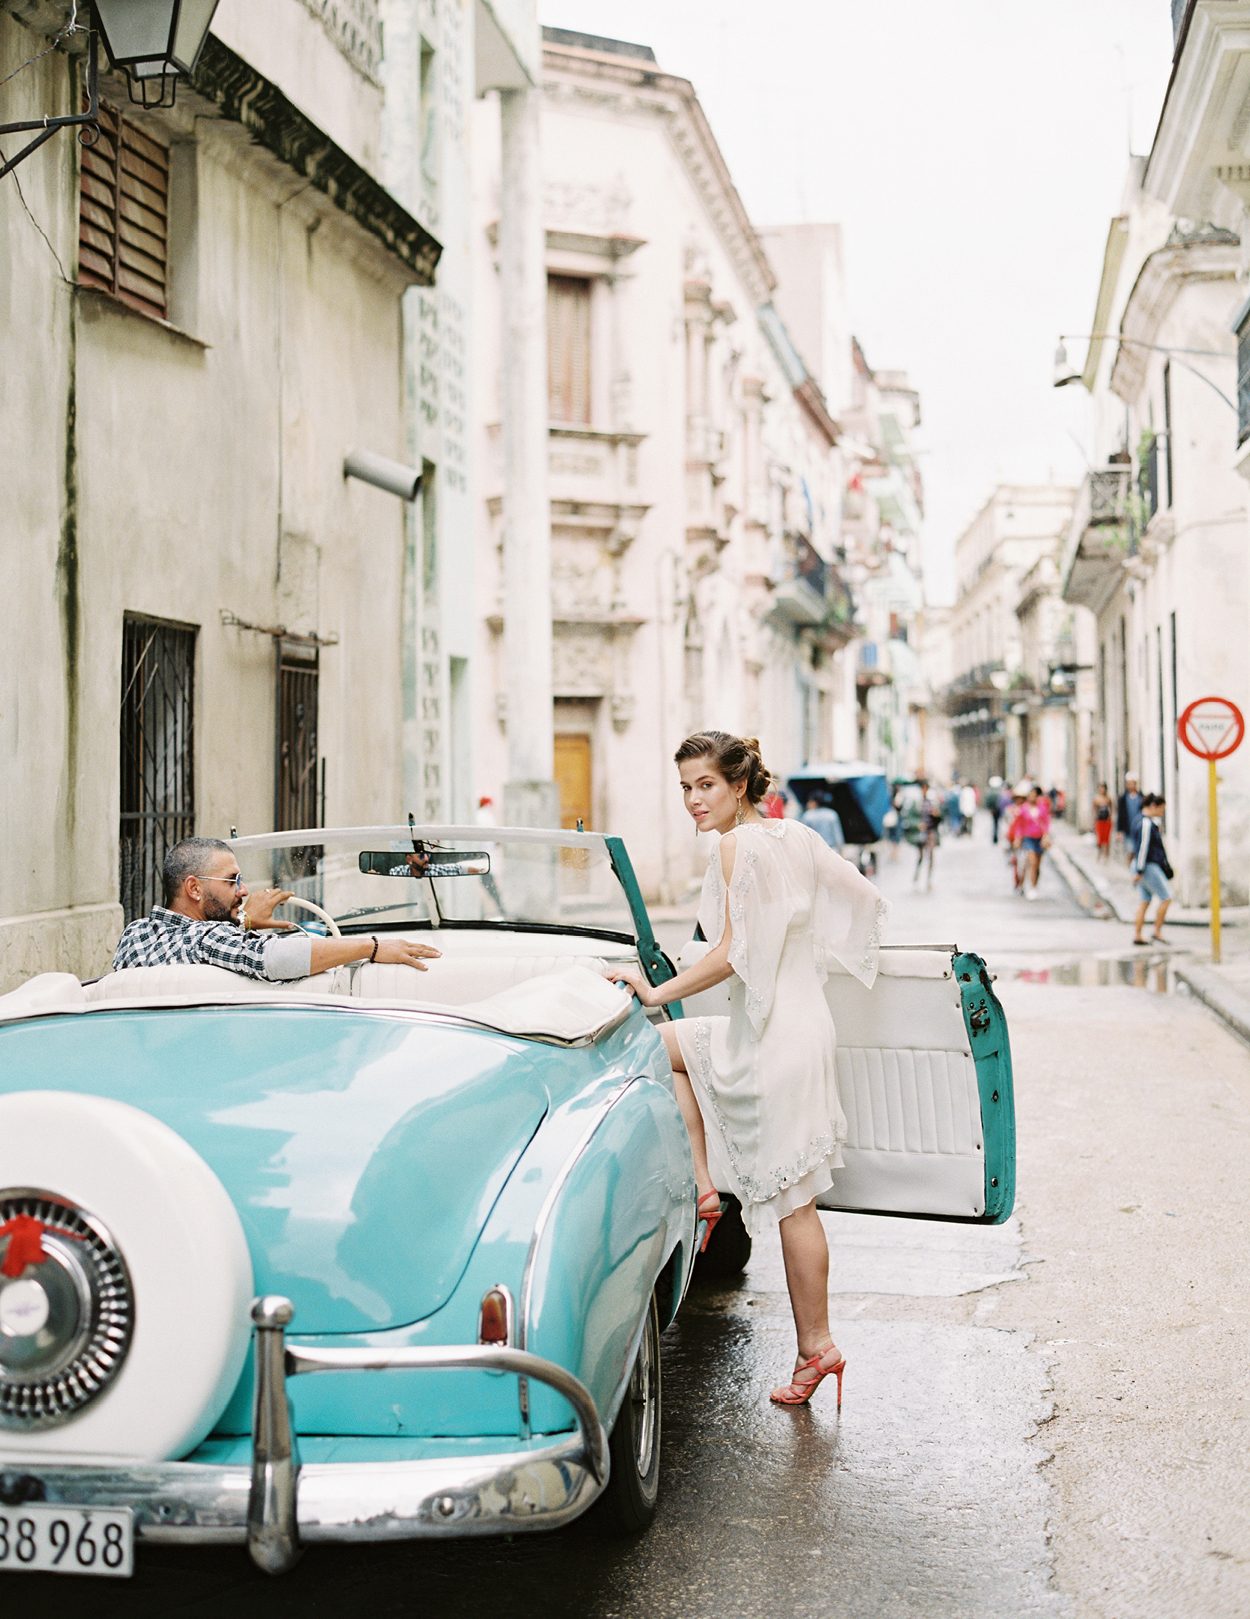 MatthewRee_Cuba_1_011.jpg